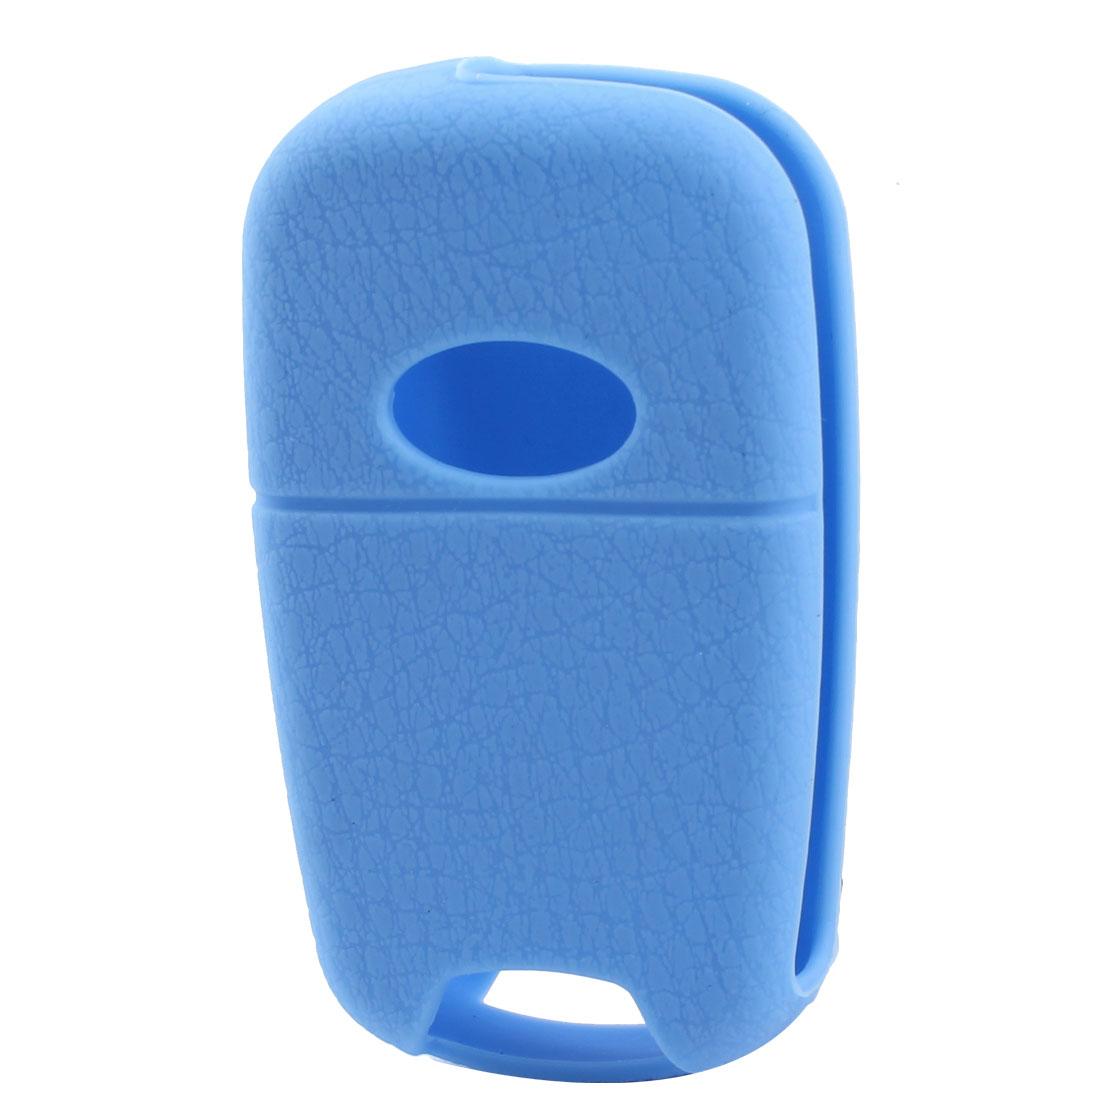 Soft Silicone AUTO Car Key Case Holder Fob Cover For Sportage Sky Blue